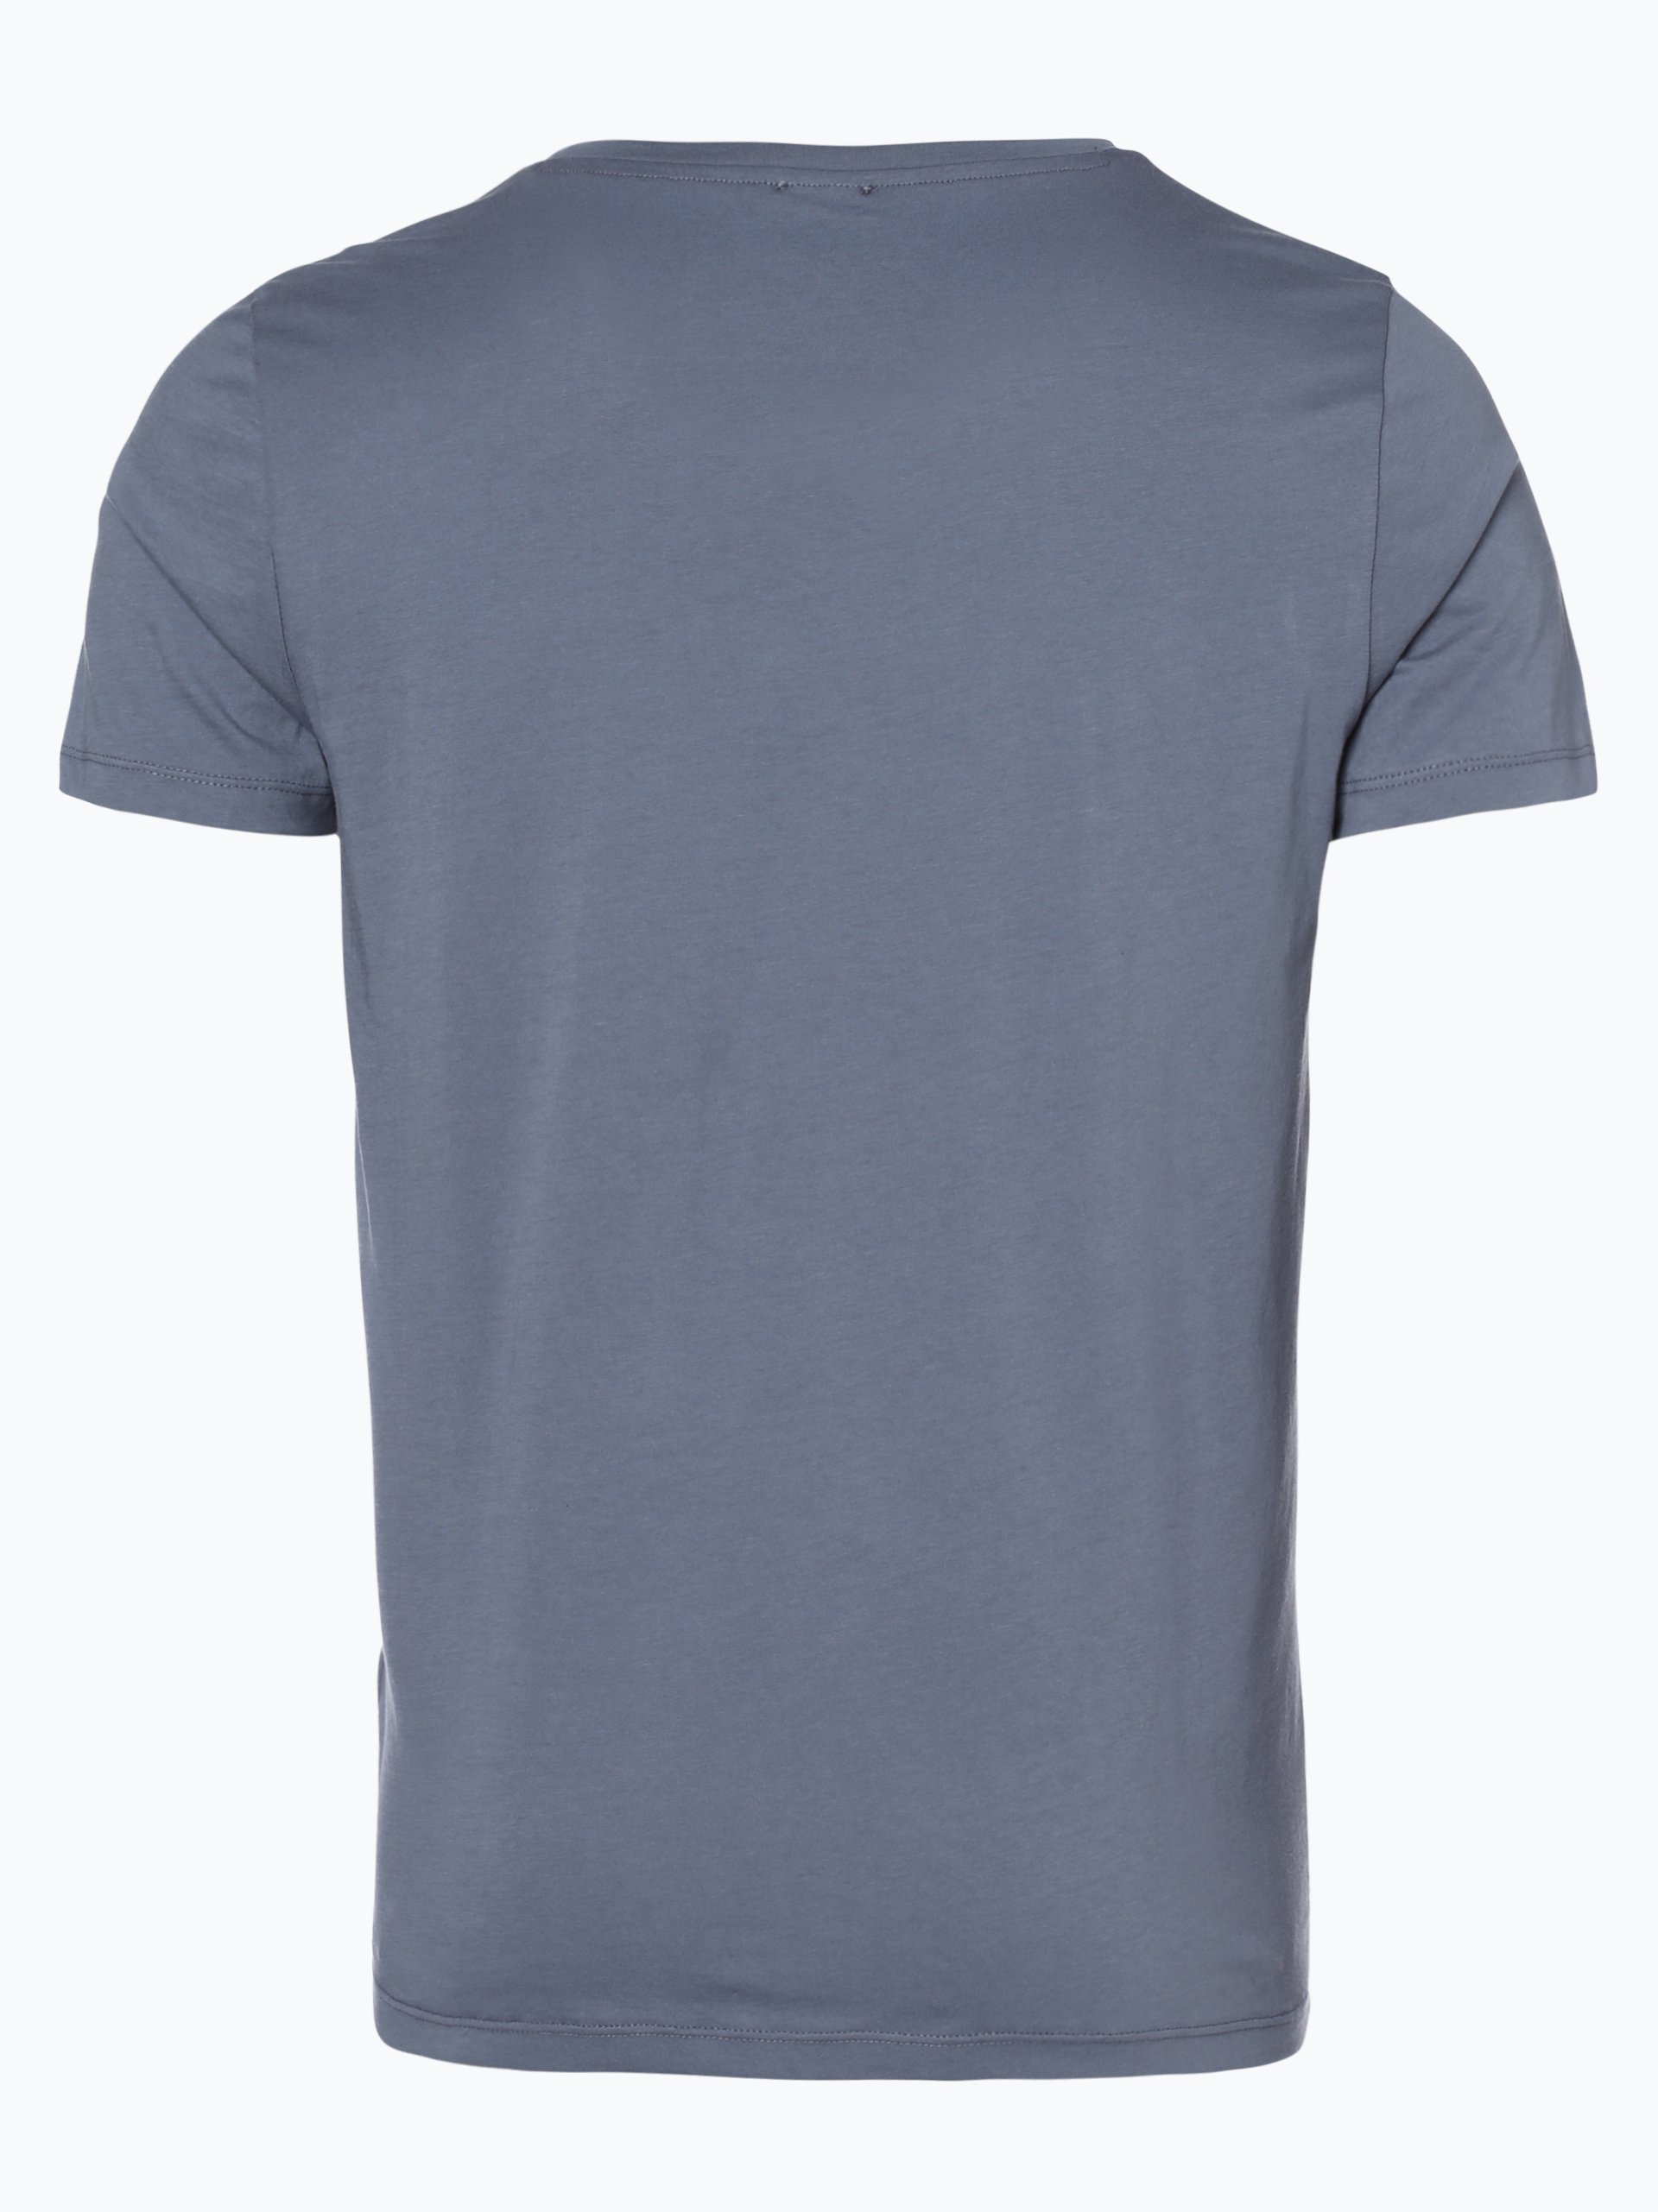 boss casual herren t shirt tew grau gemustert online. Black Bedroom Furniture Sets. Home Design Ideas